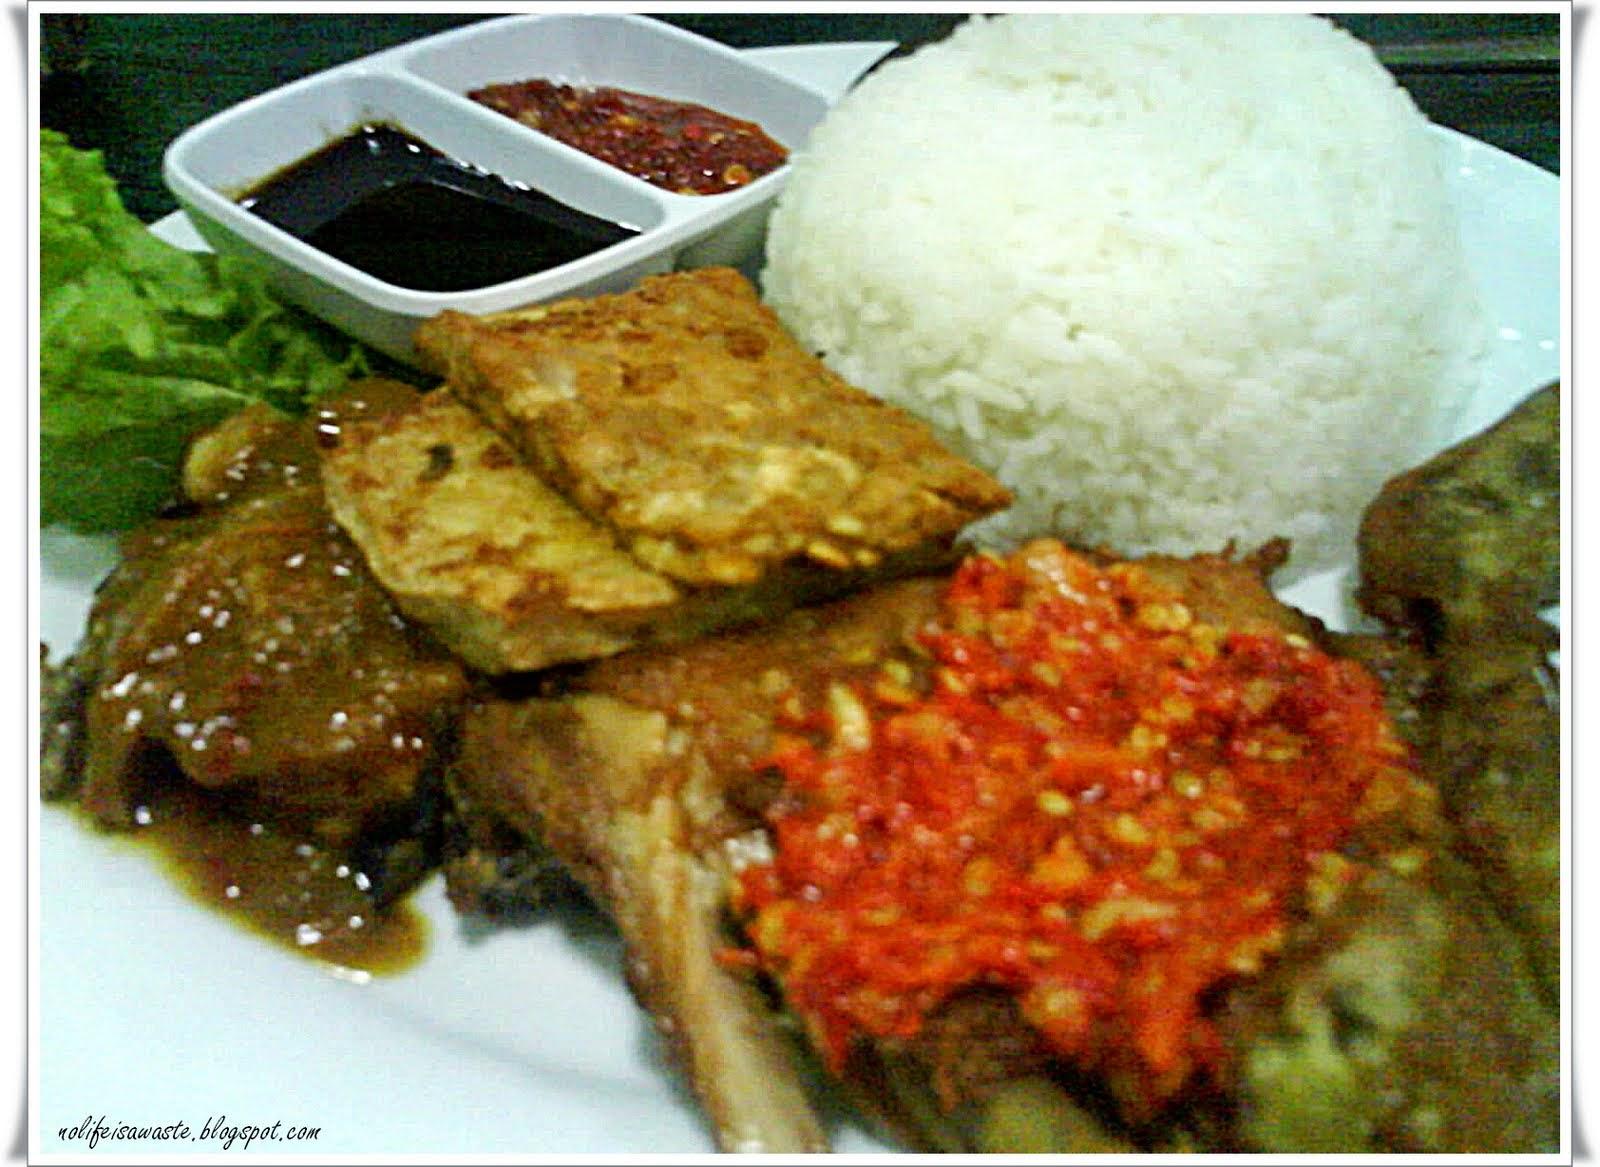 Resepi sambal ayam penyet images for Azian cuisine menu